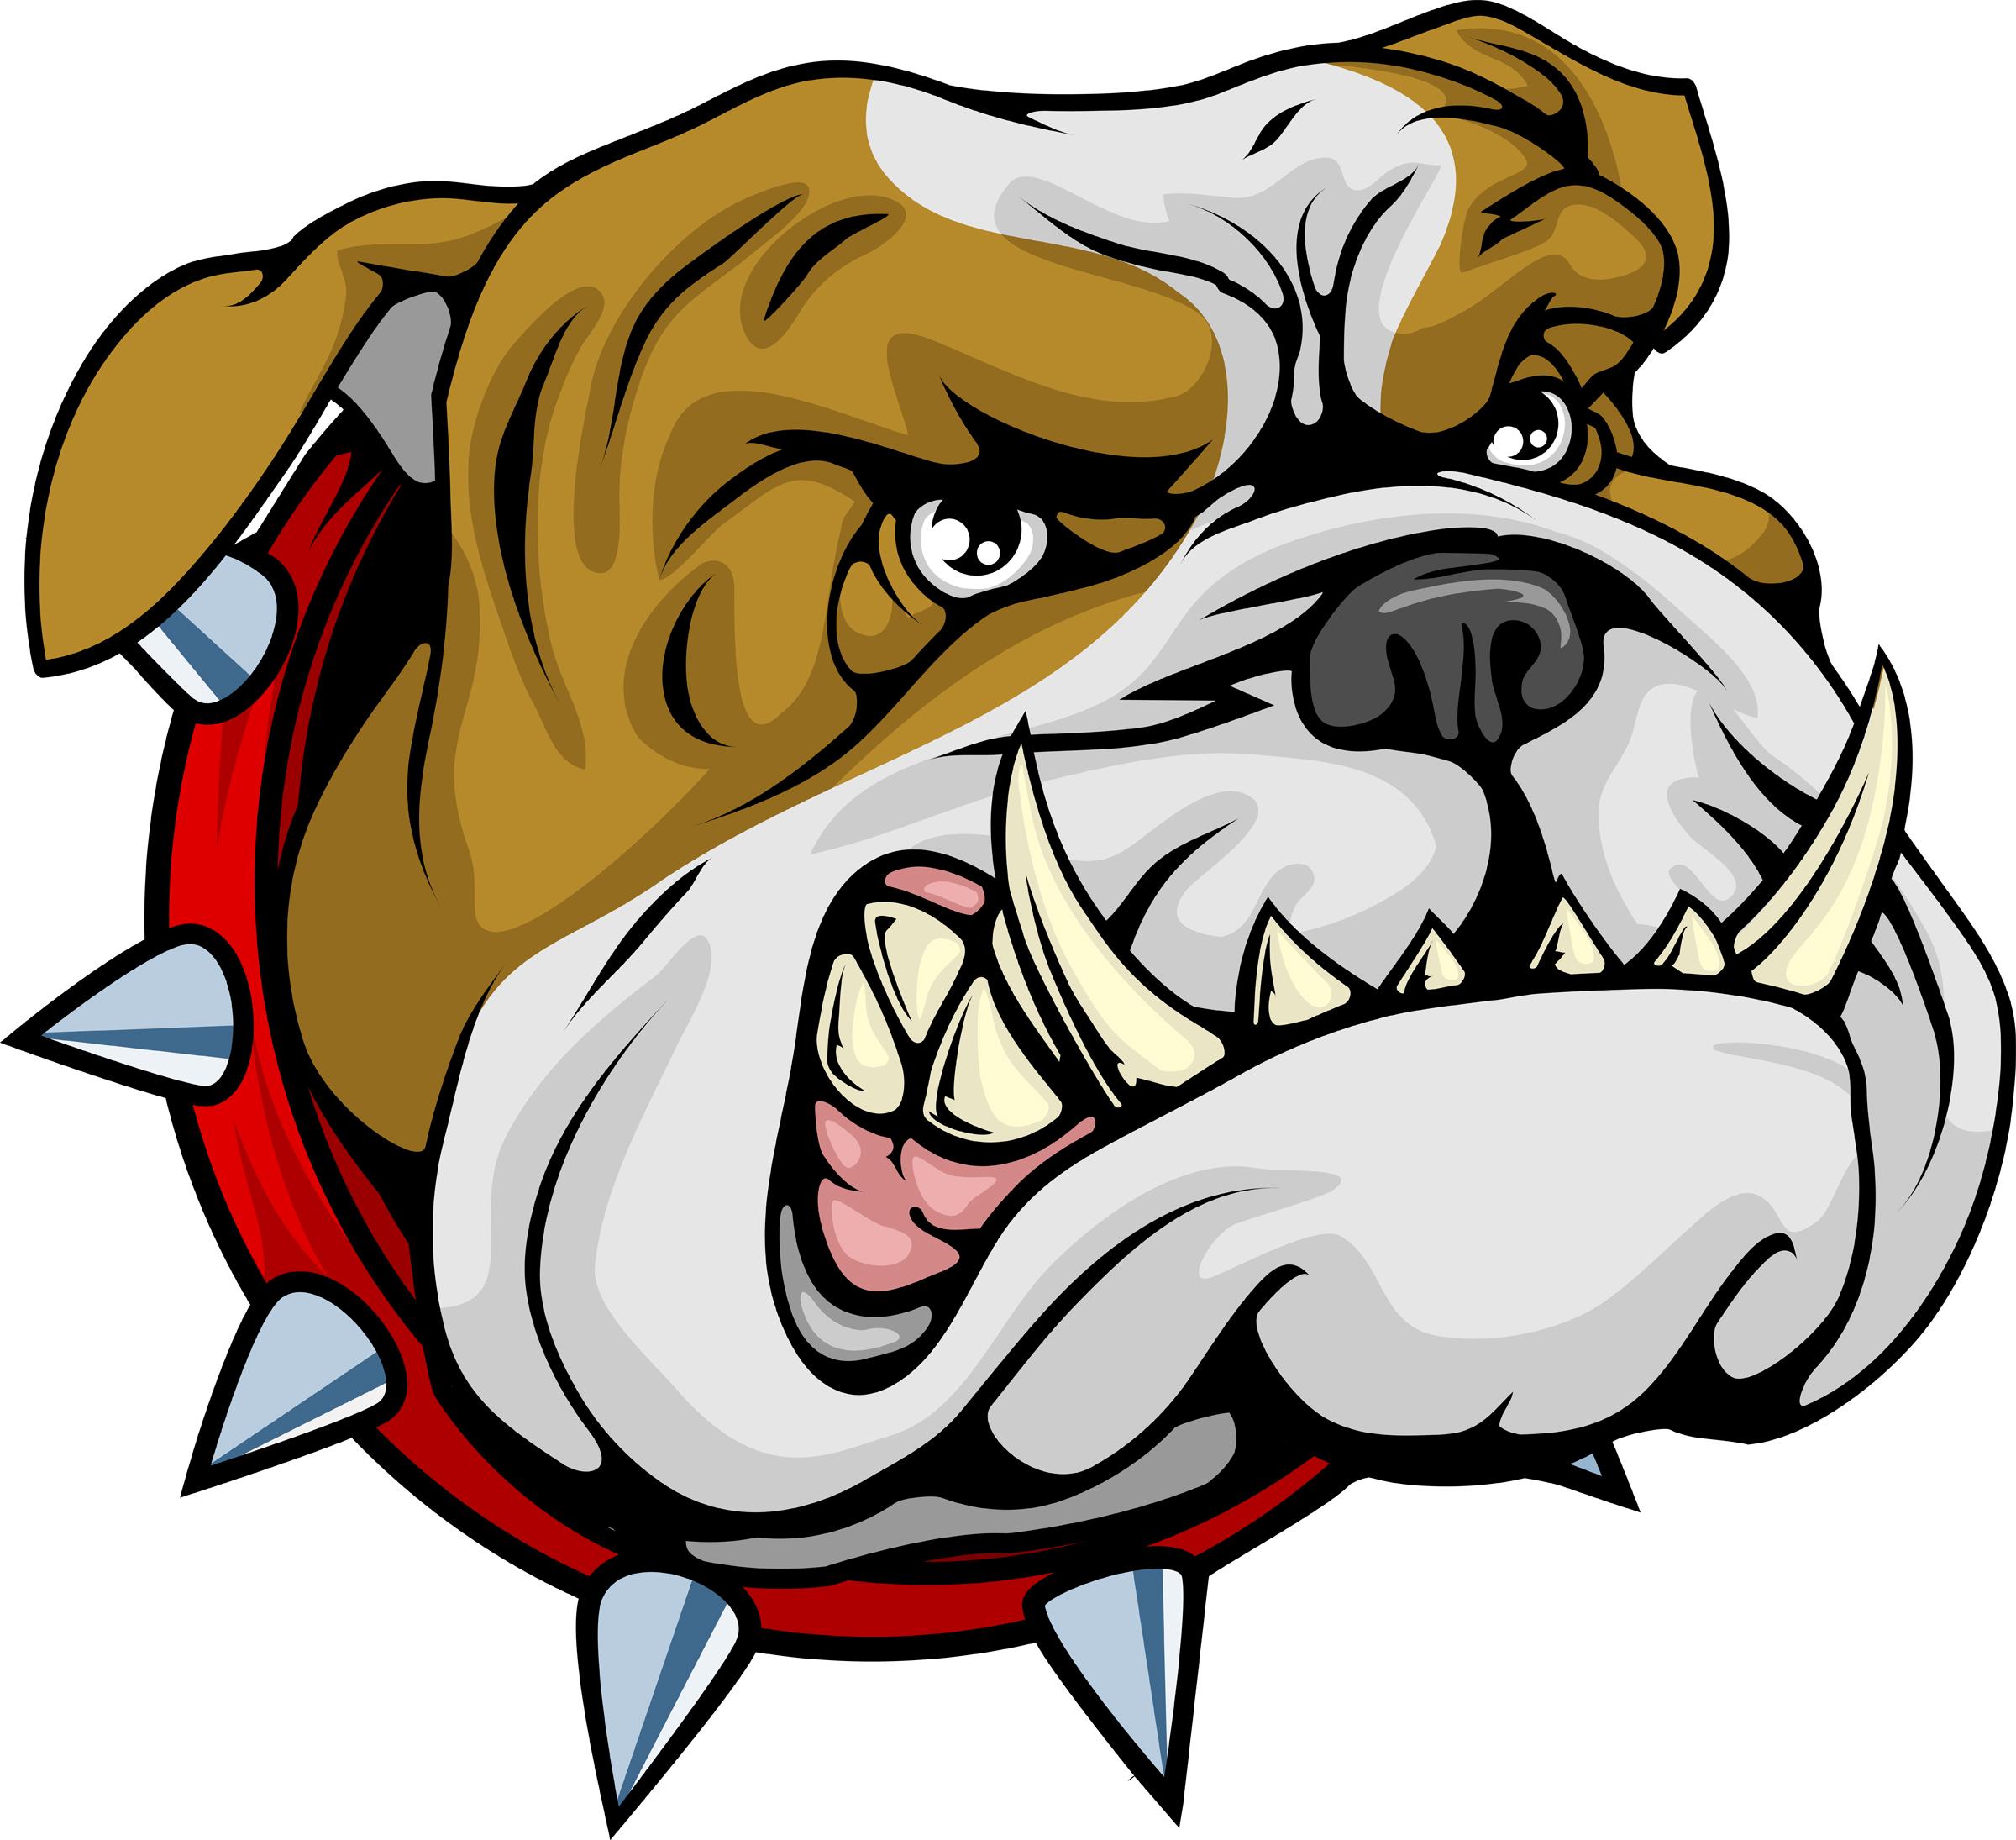 Bulldog head clipart dromgip top.